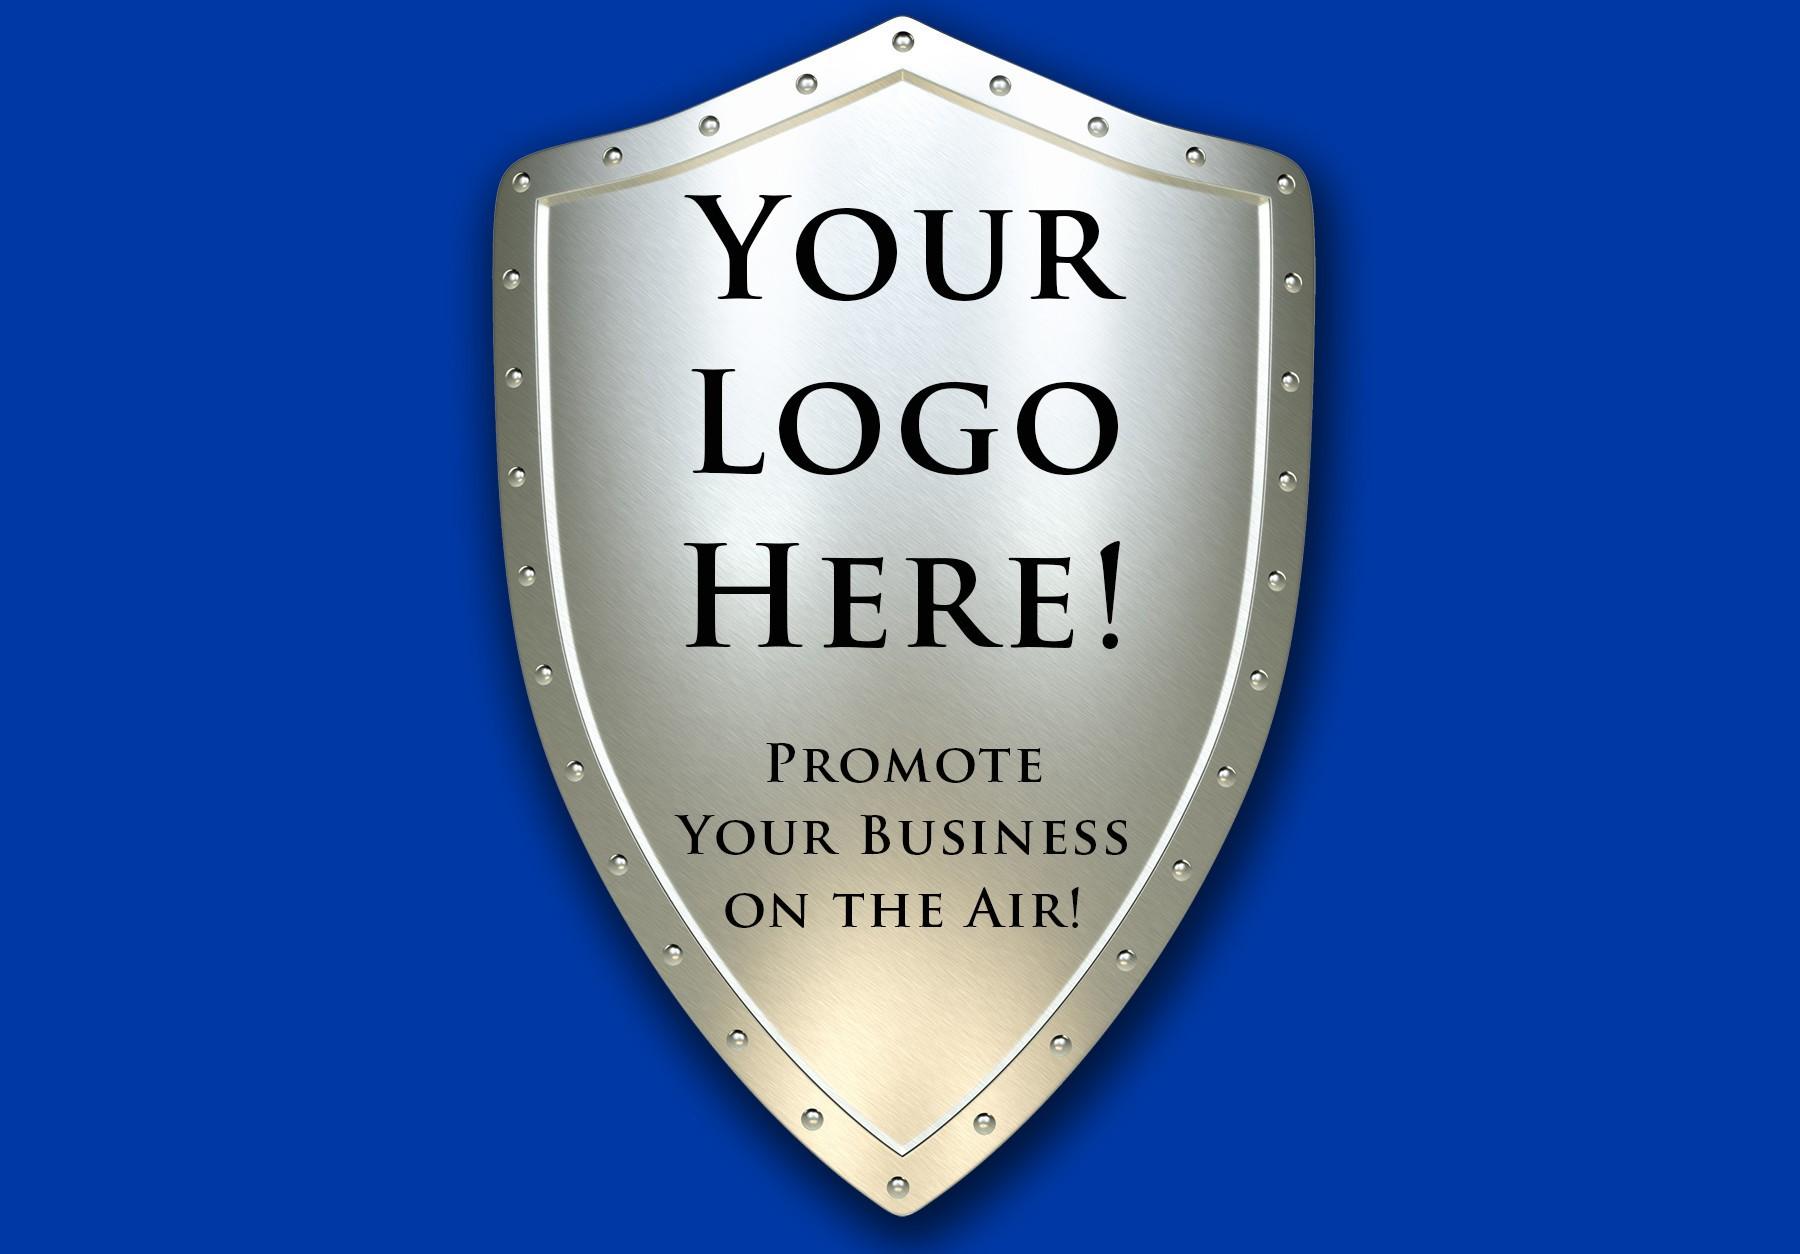 Your Logo Here Hoiz